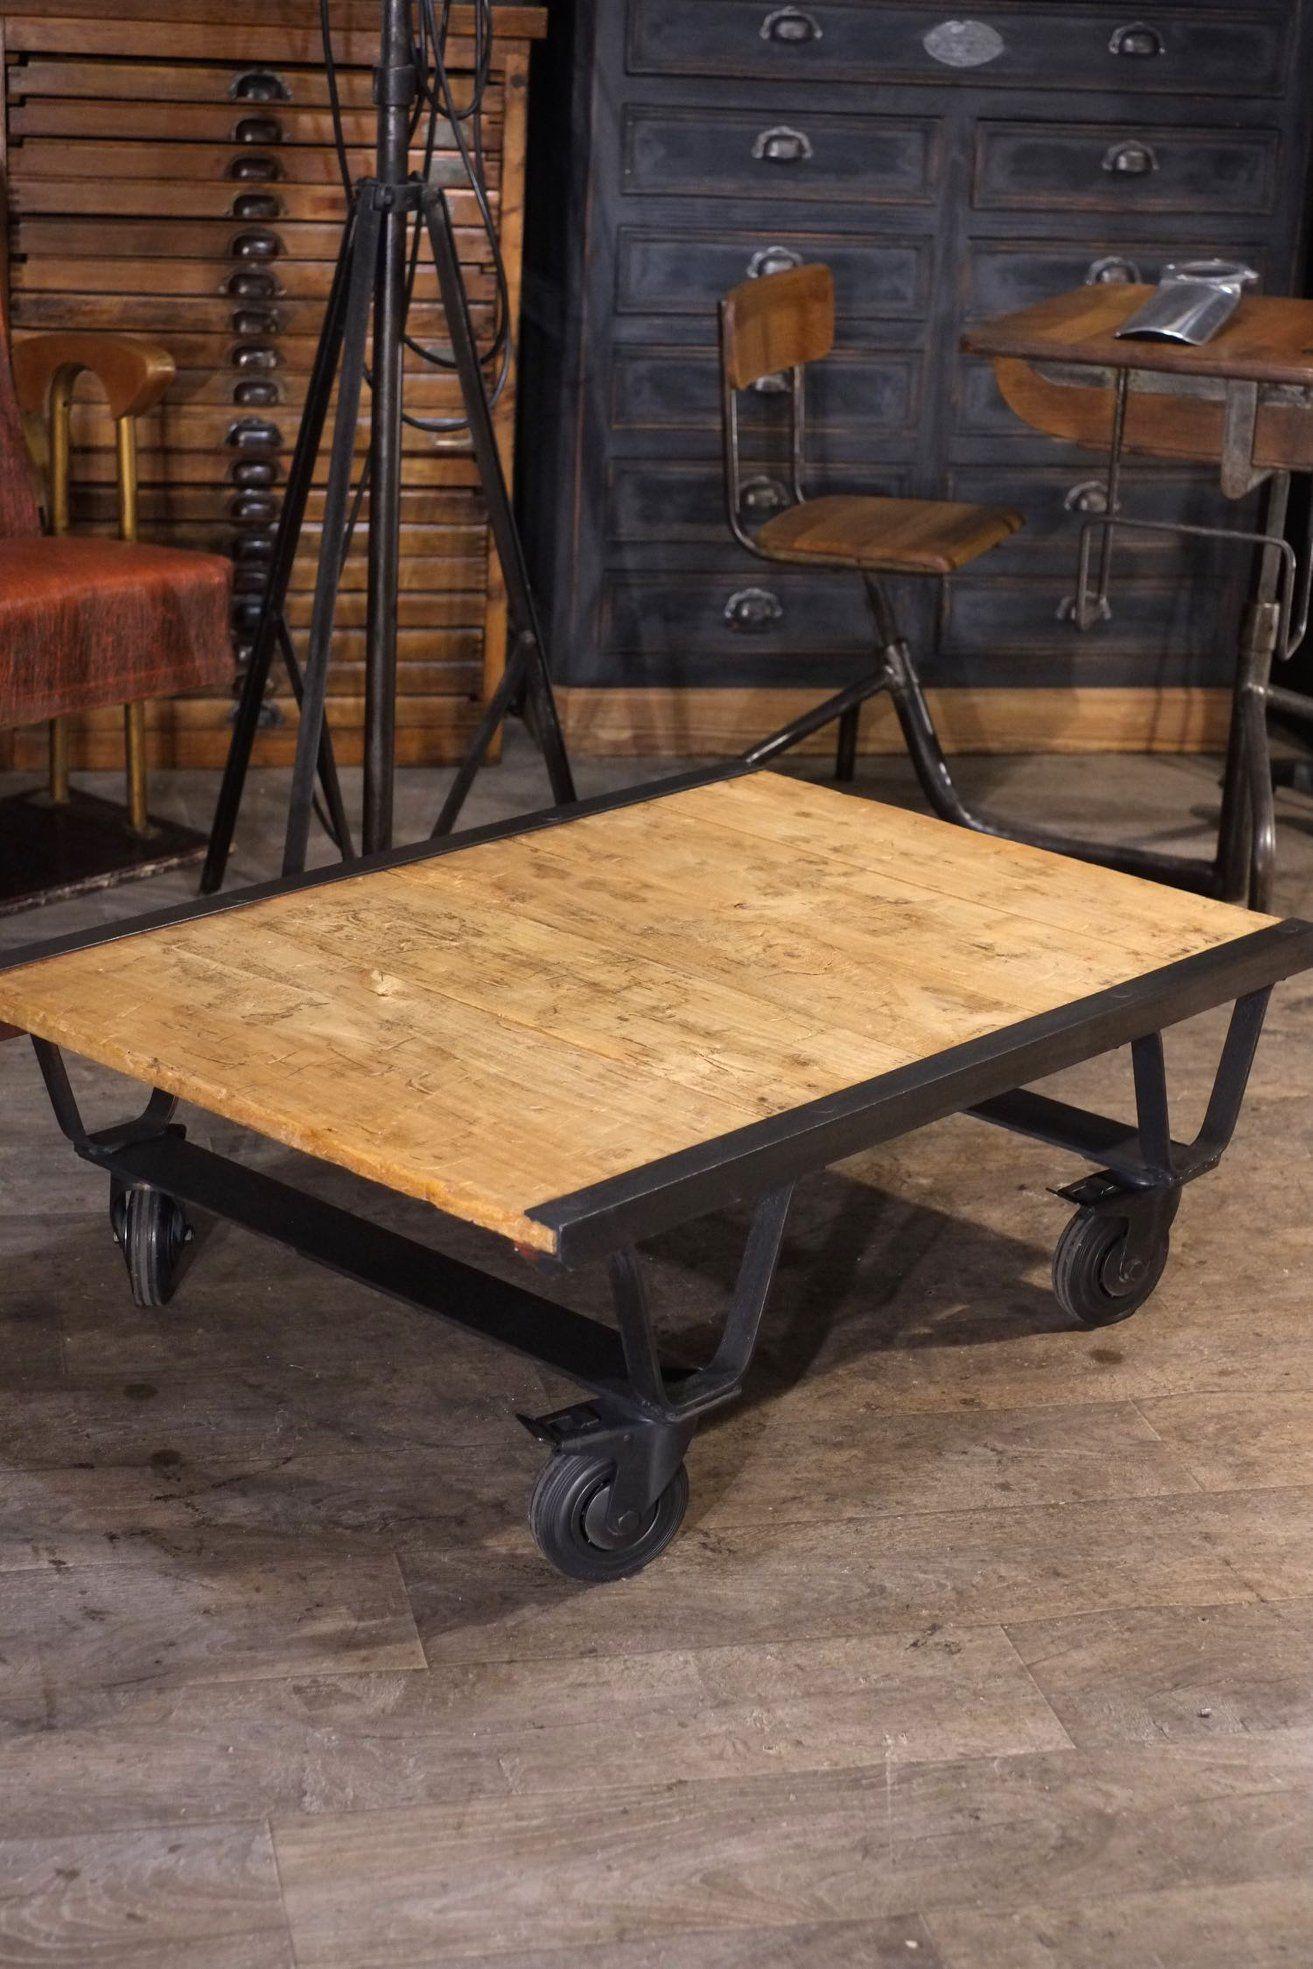 Palette Ancienne Sncf Detourne En Table Basse Plus D Info Sur Https Ift Tt 1opl503 Deco Design Antiquitesdesign En 2020 Mobilier Design Design Industriel Design